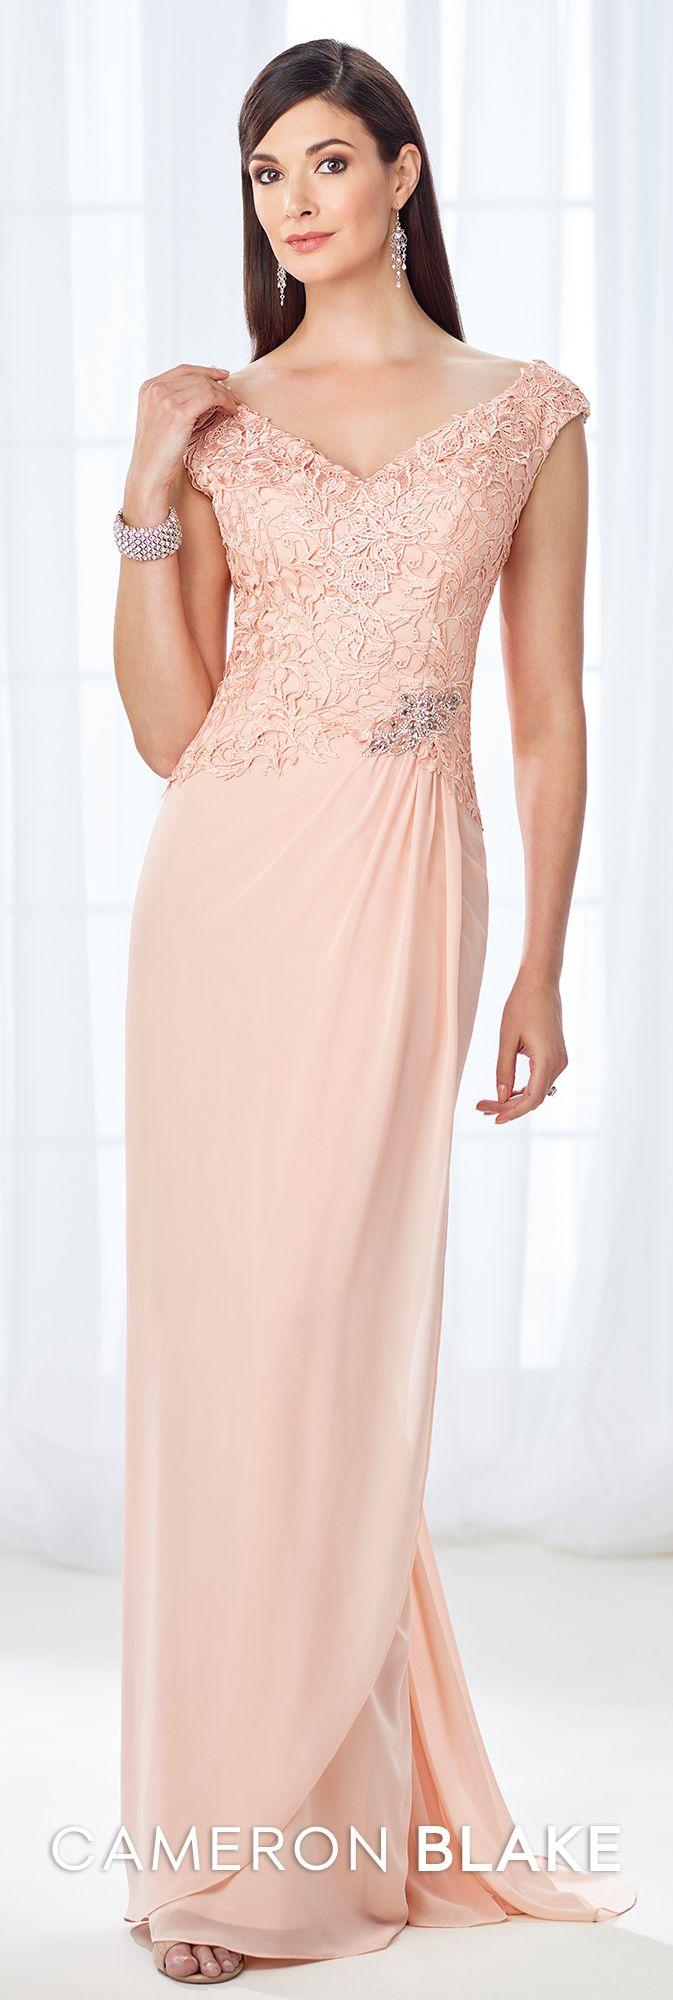 Cameron Blake - Evening Dresses - 118674 | Vestidos coctel, Vestido ...